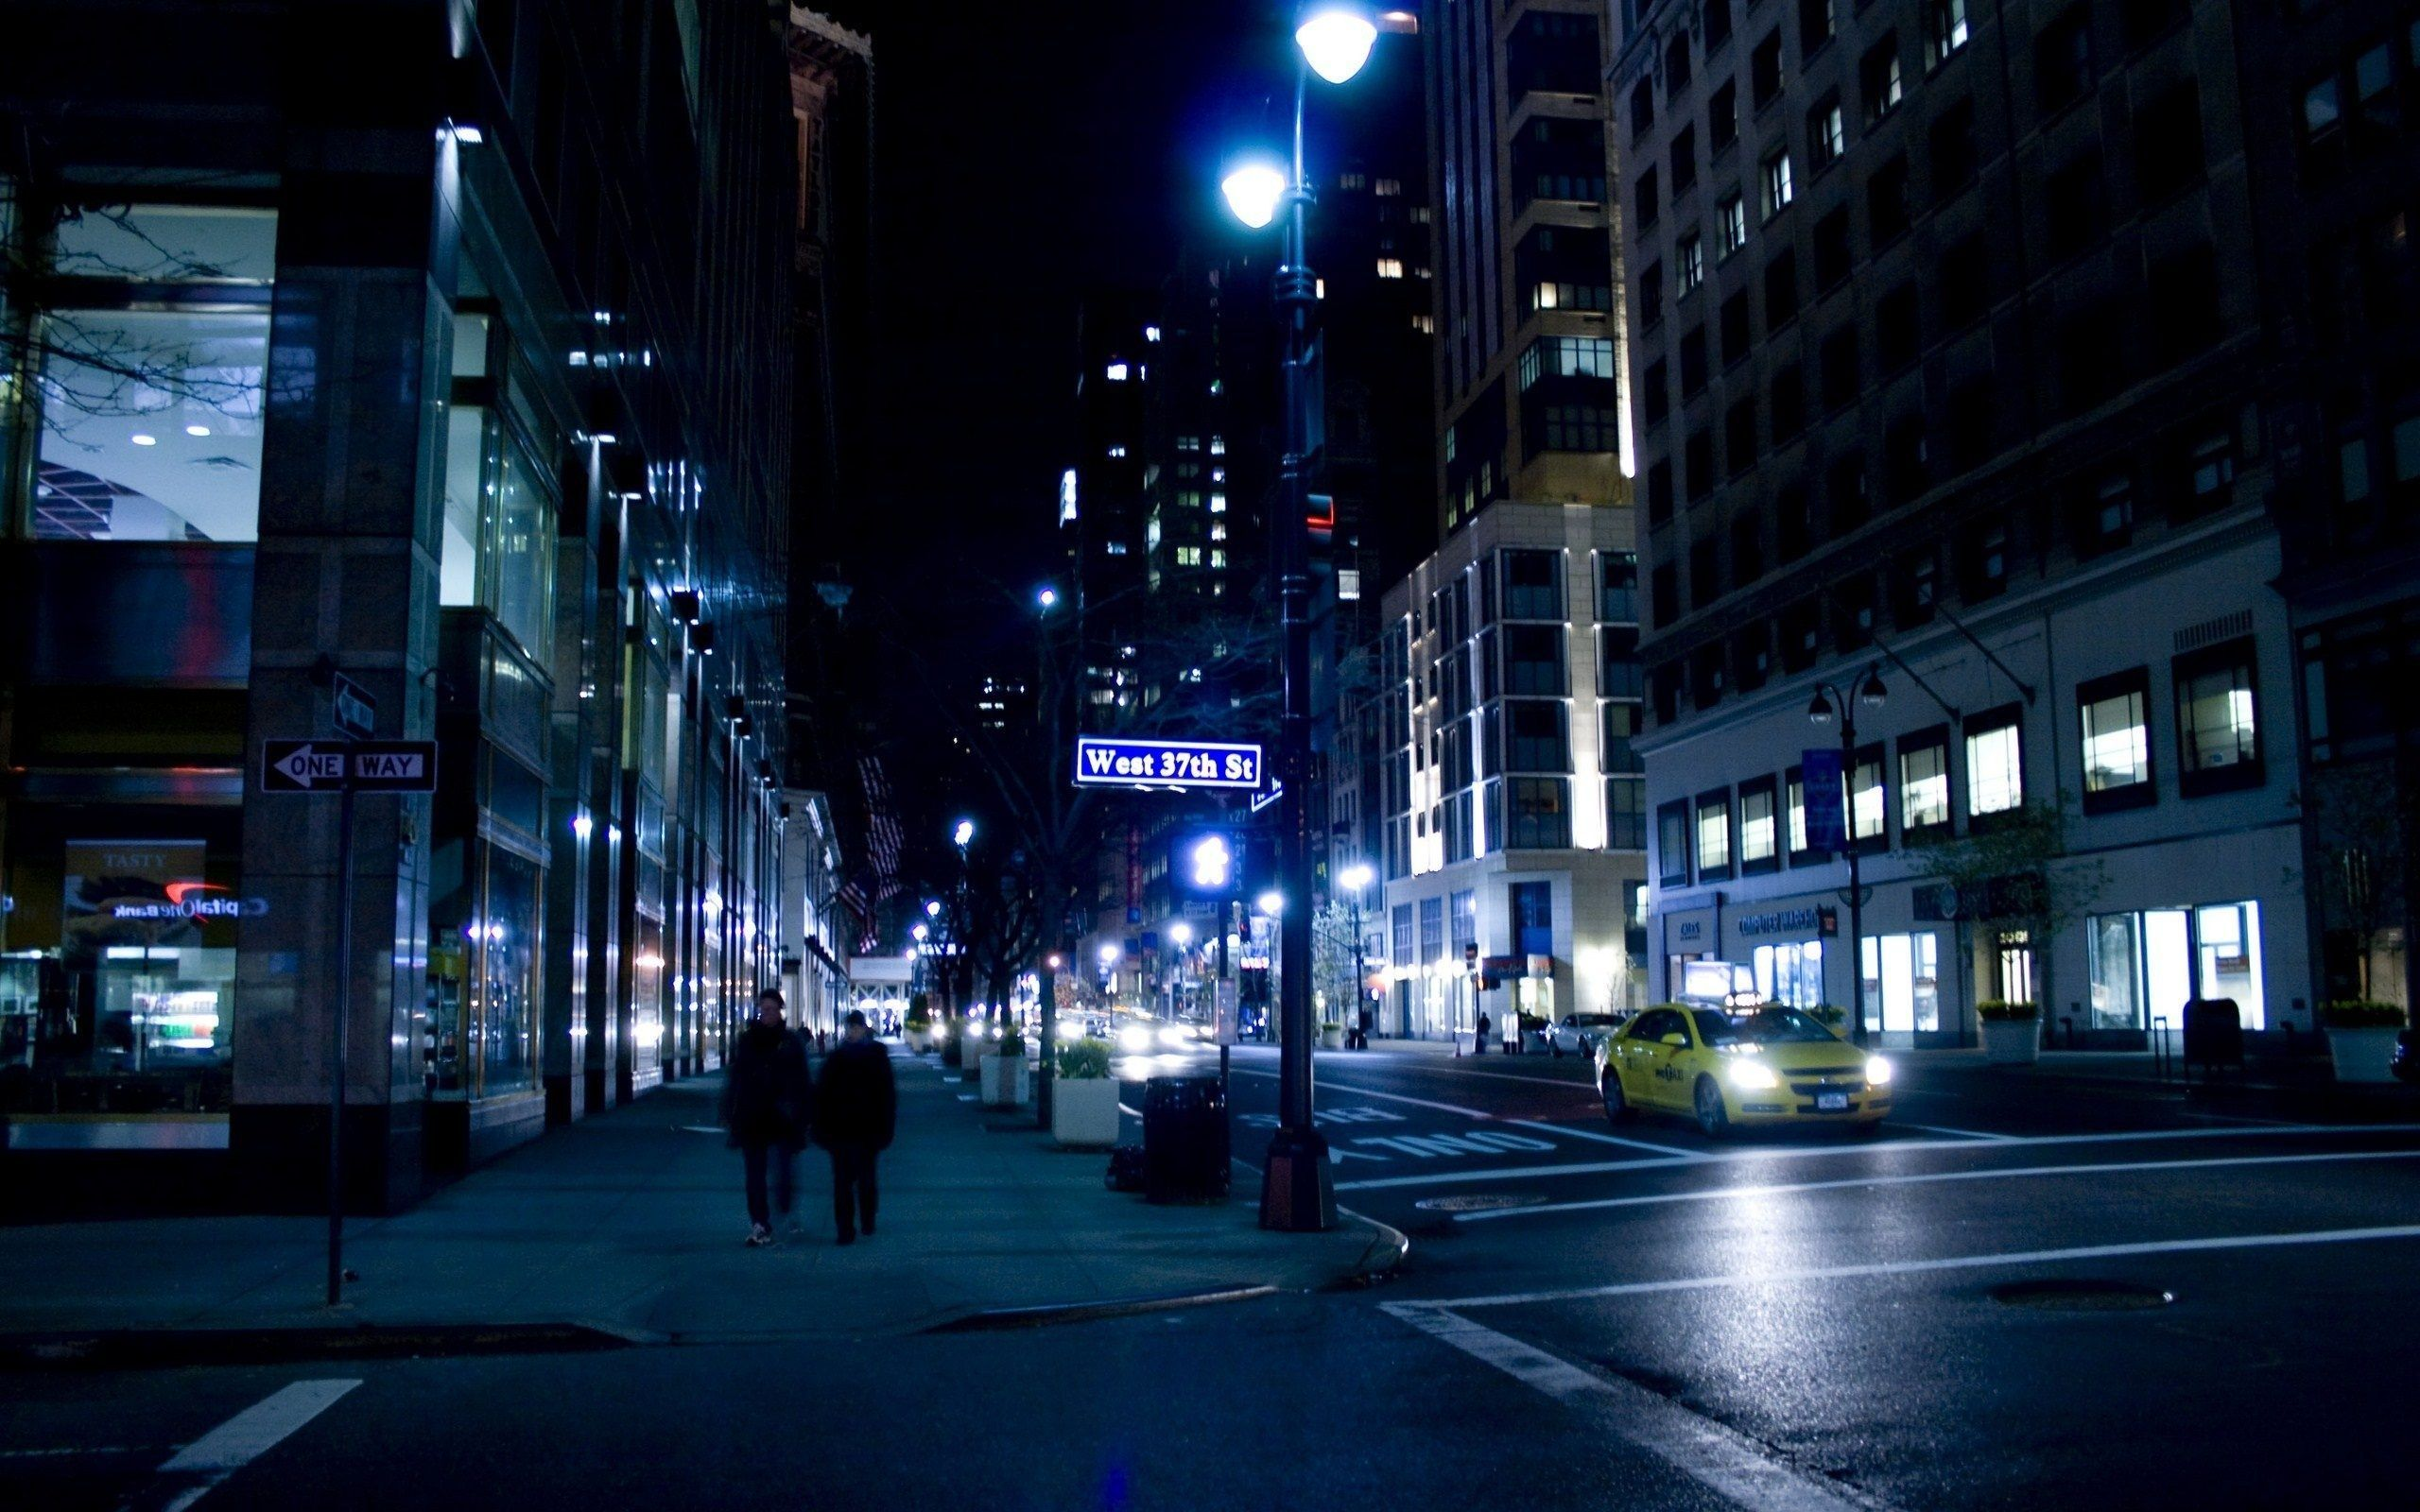 Epingle Par Lionel Kresperne Sur Night Pinterest Night City